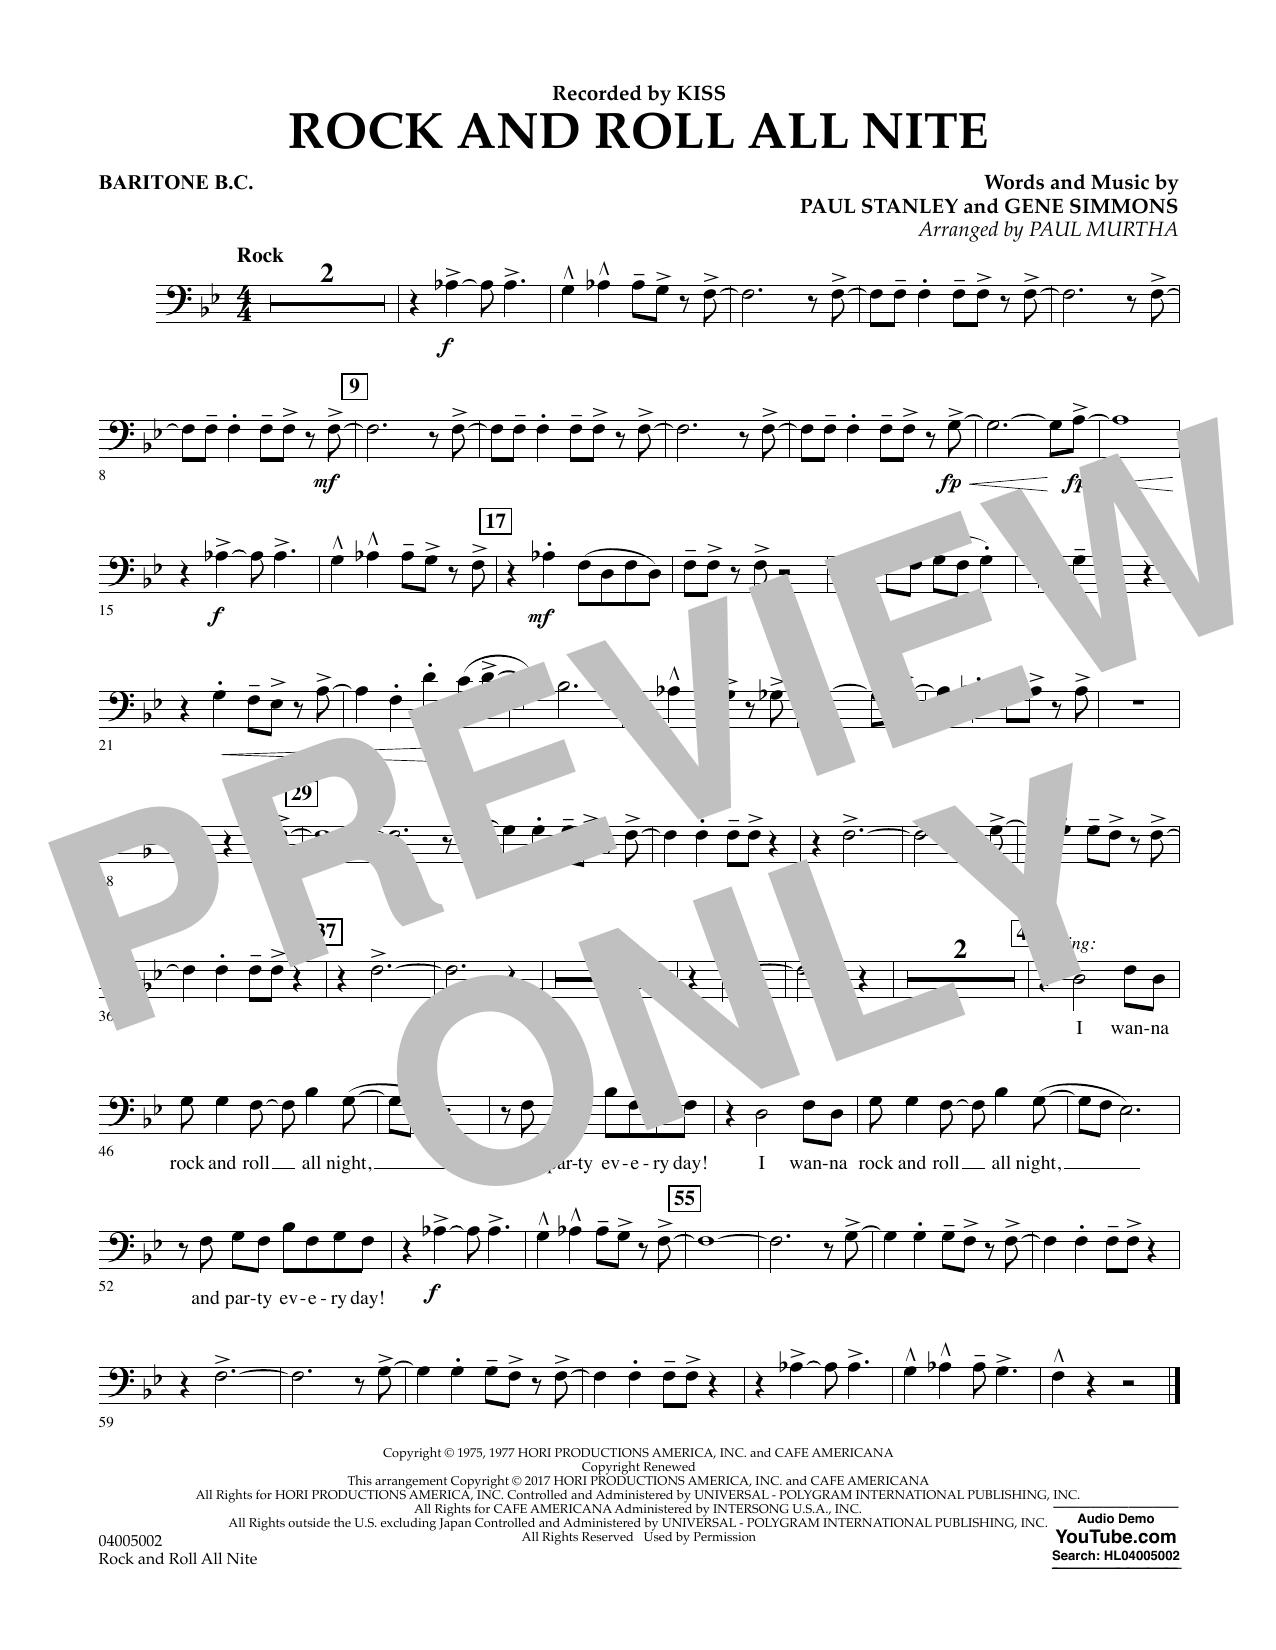 Rock and Roll All Nite - Baritone B.C. Sheet Music